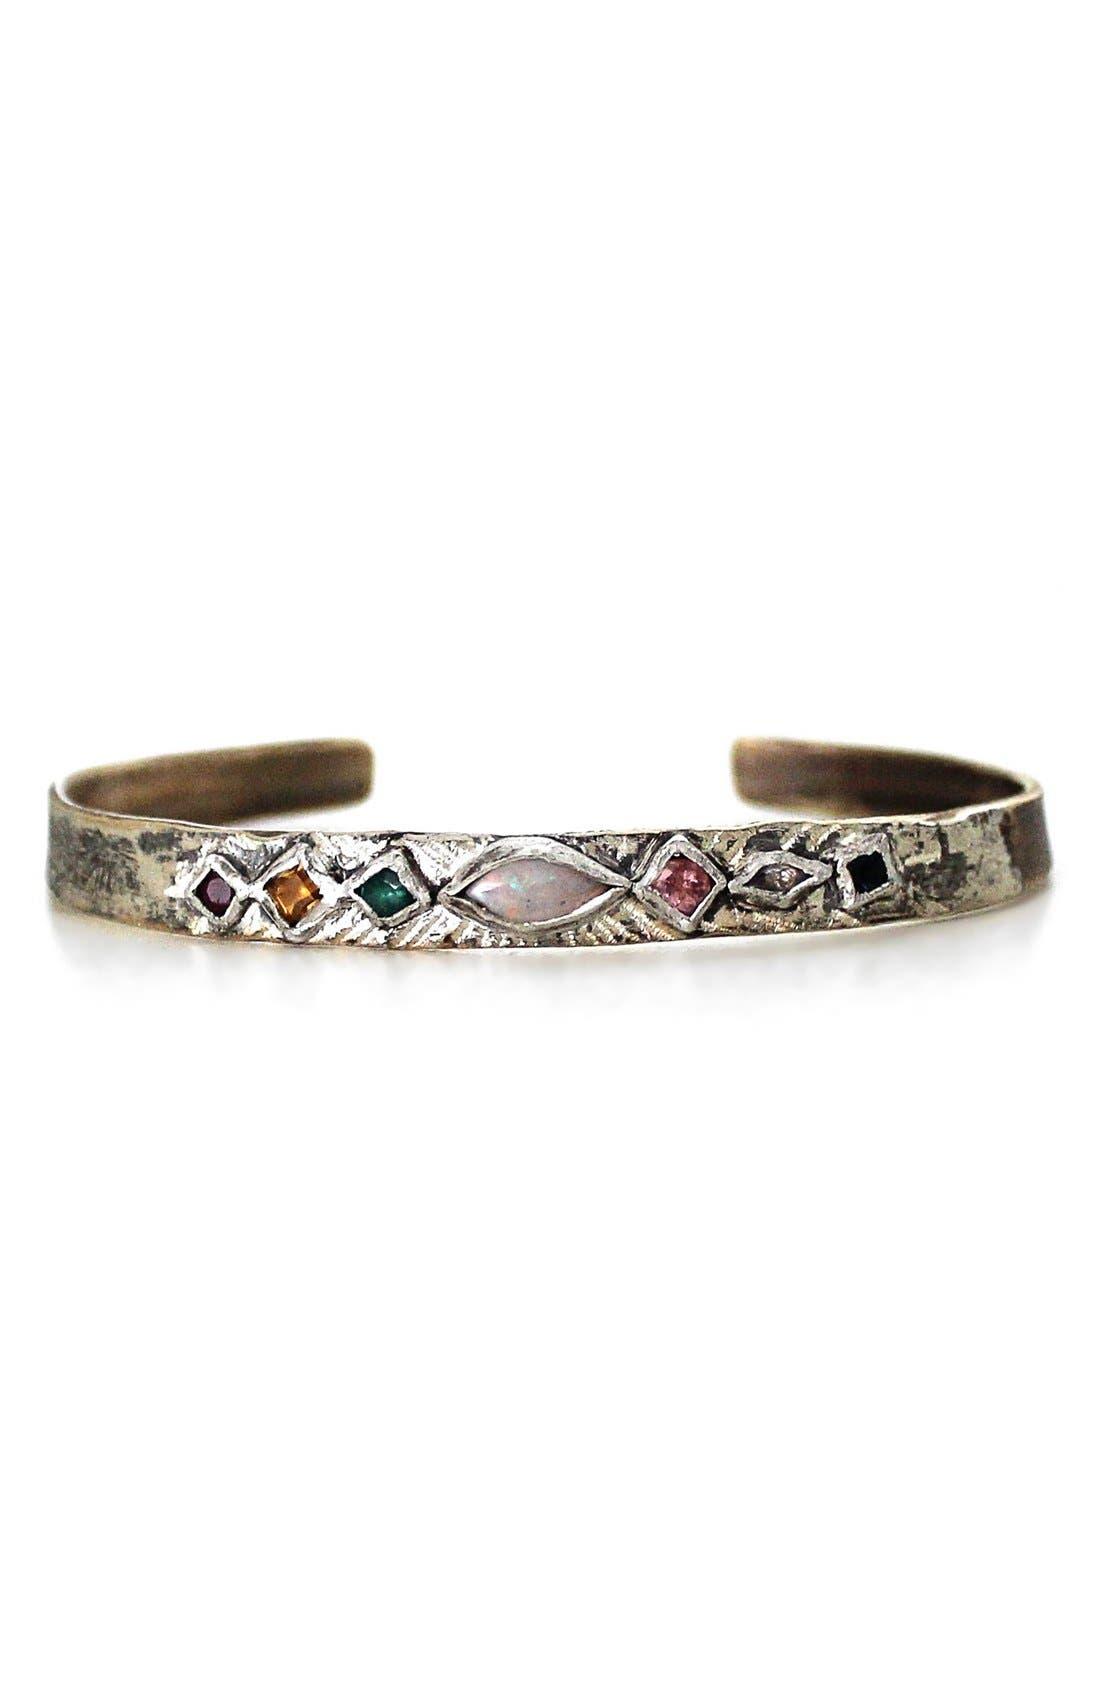 Alternate Image 1 Selected - Franny E Jewelry Mixed Gem Cuff Bracelet